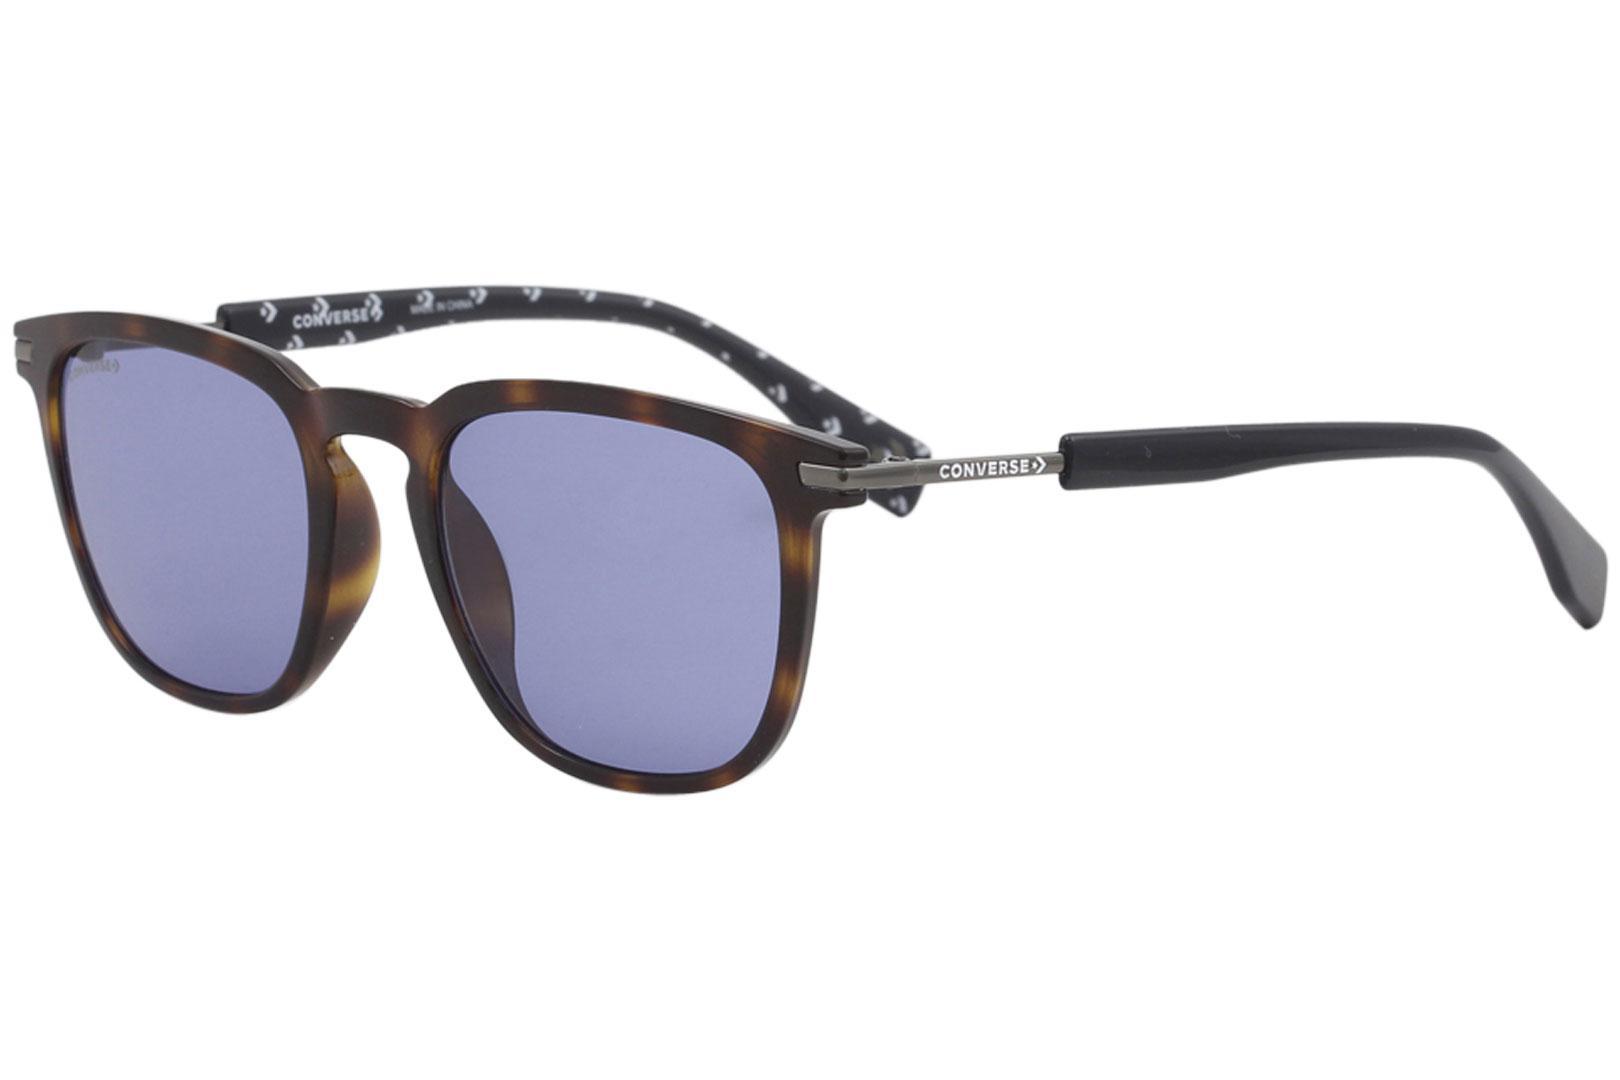 e0ea867a590 ... Fashion Rectangle Sunglasses by Converse. Touch to zoom